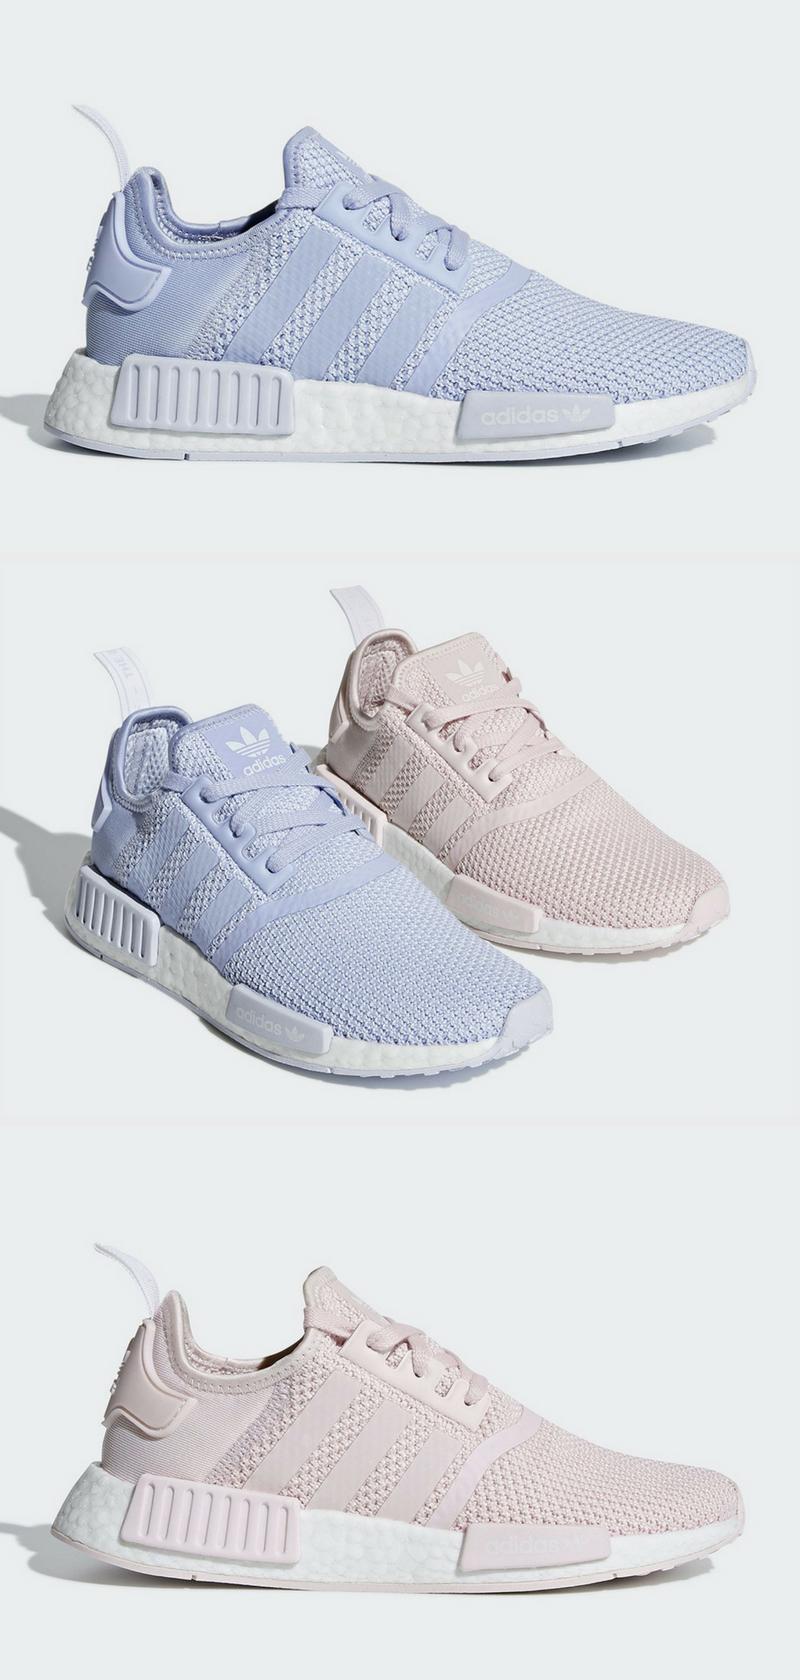 dca7baaec1cf5  sneakers  pink  shoes  adidasnmd  adidasoriginals